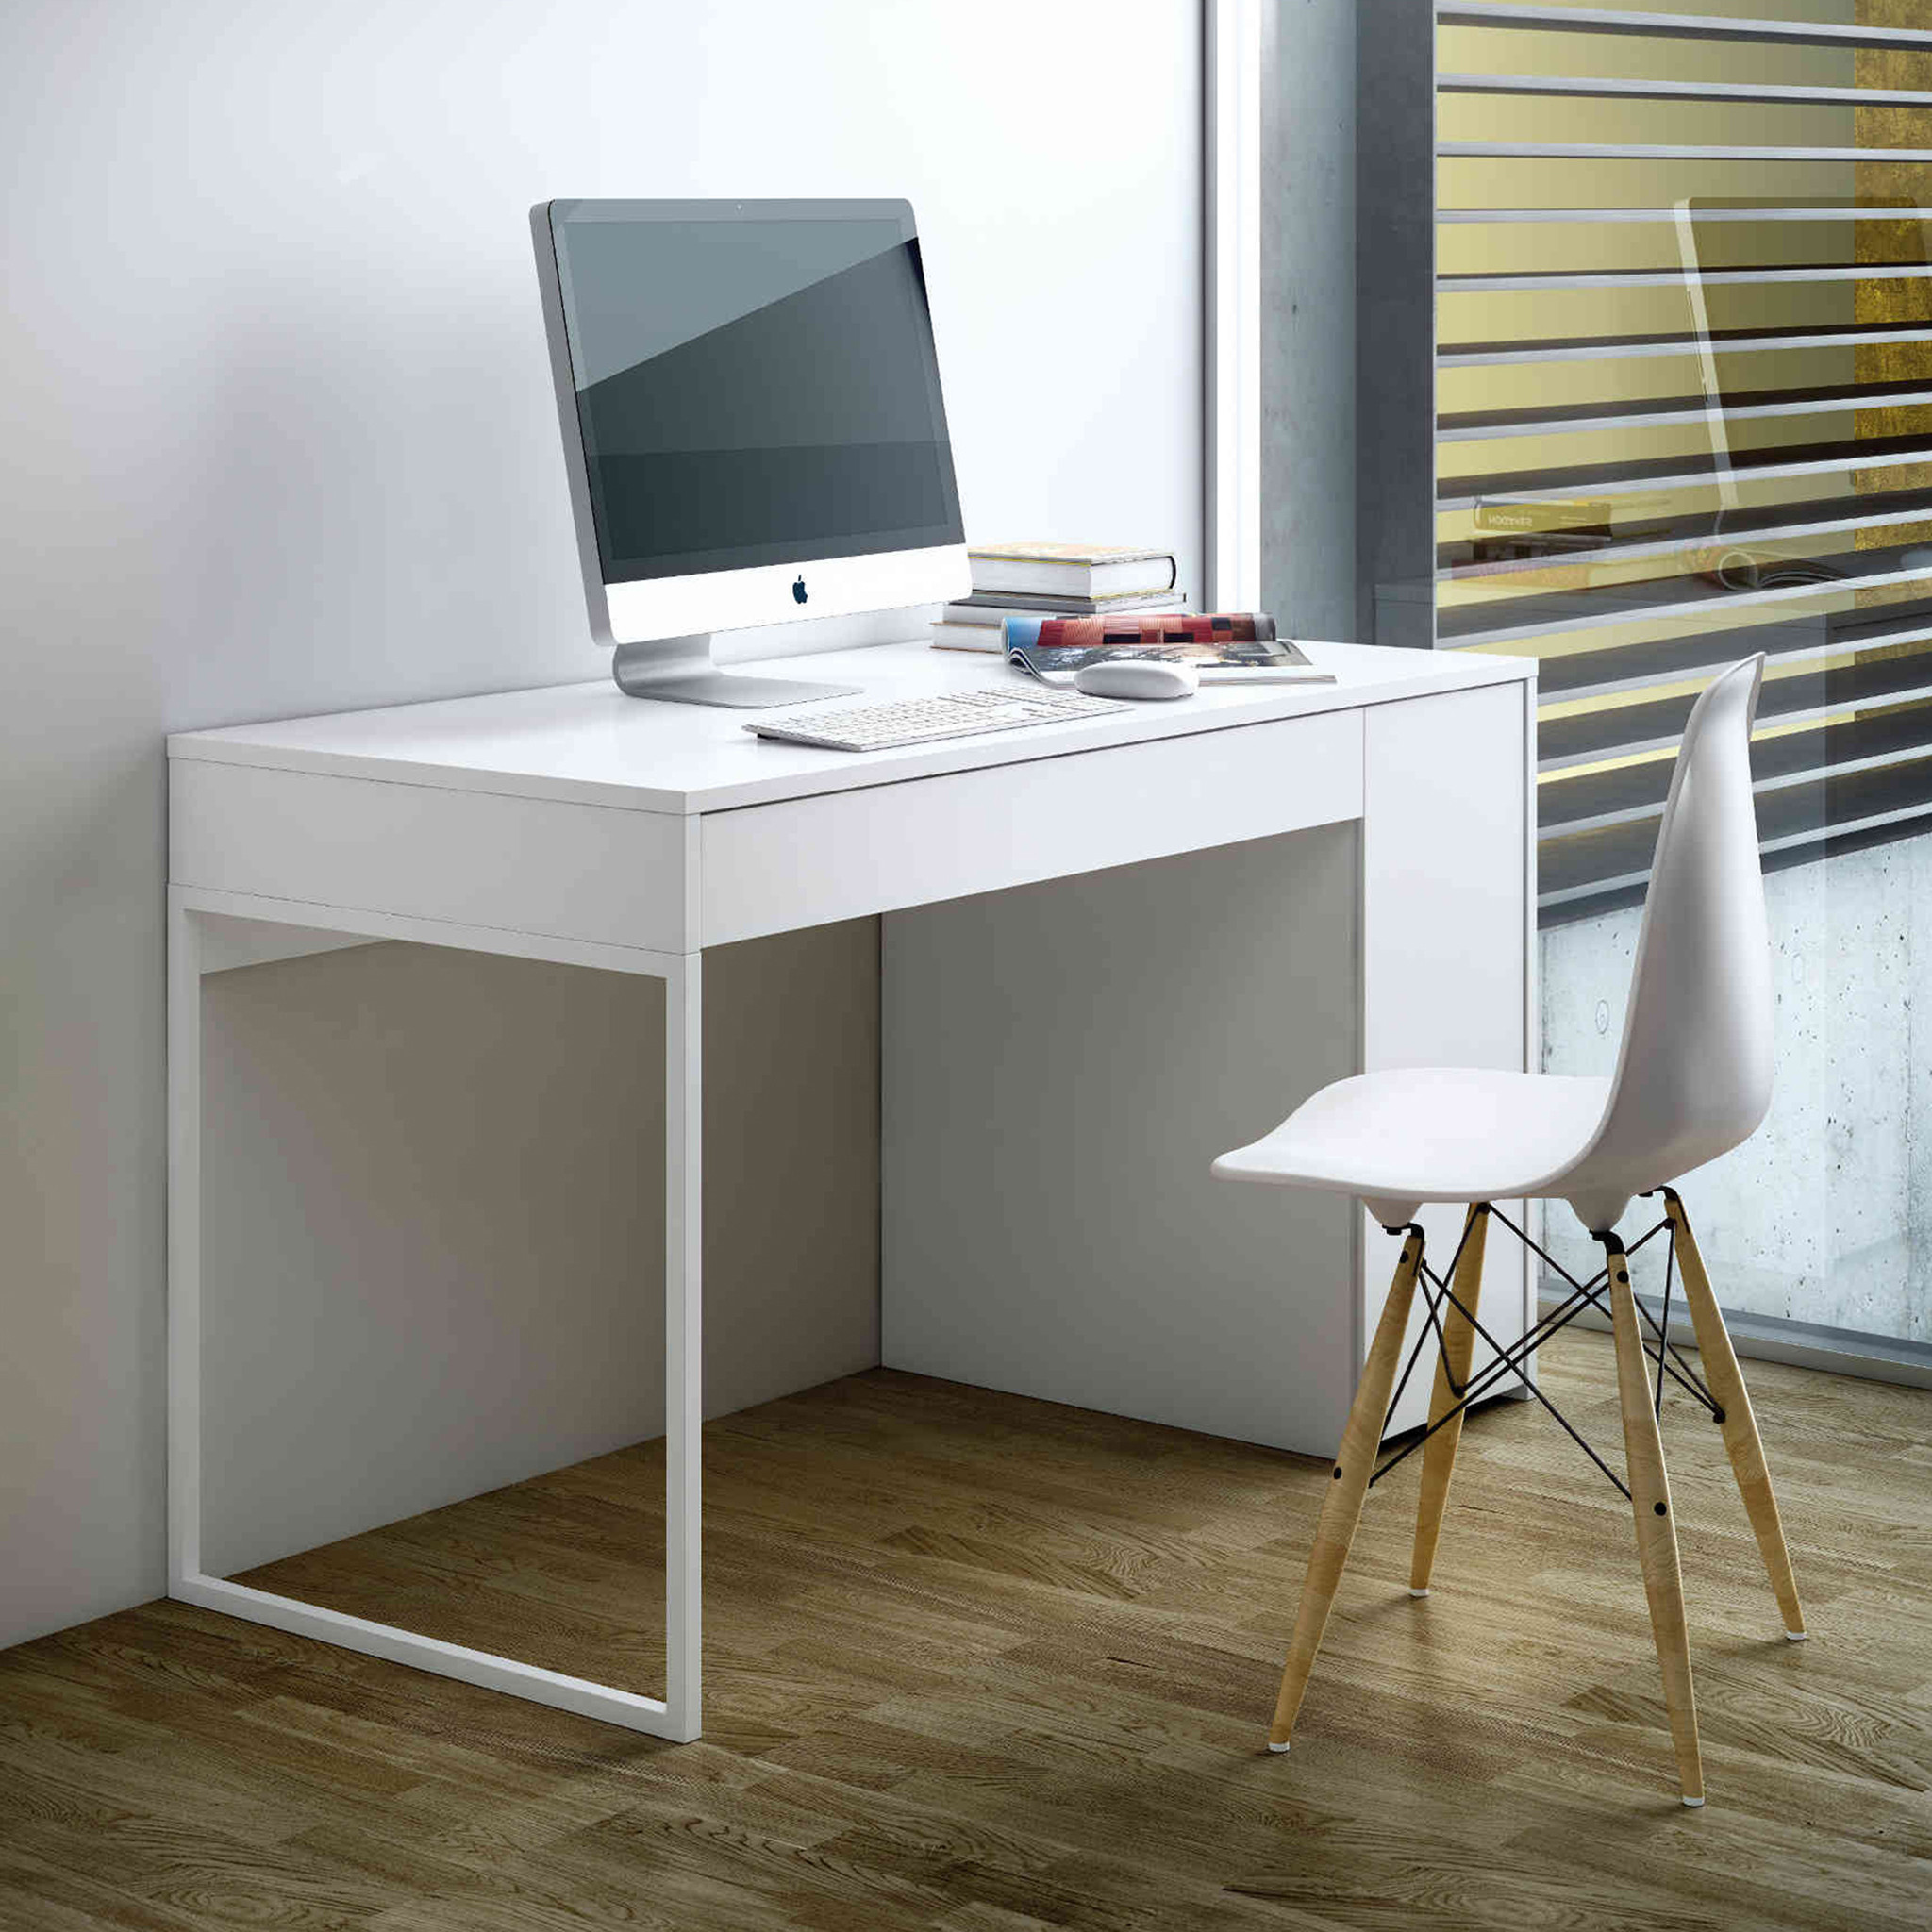 Bureau en bois blanc - BU0009